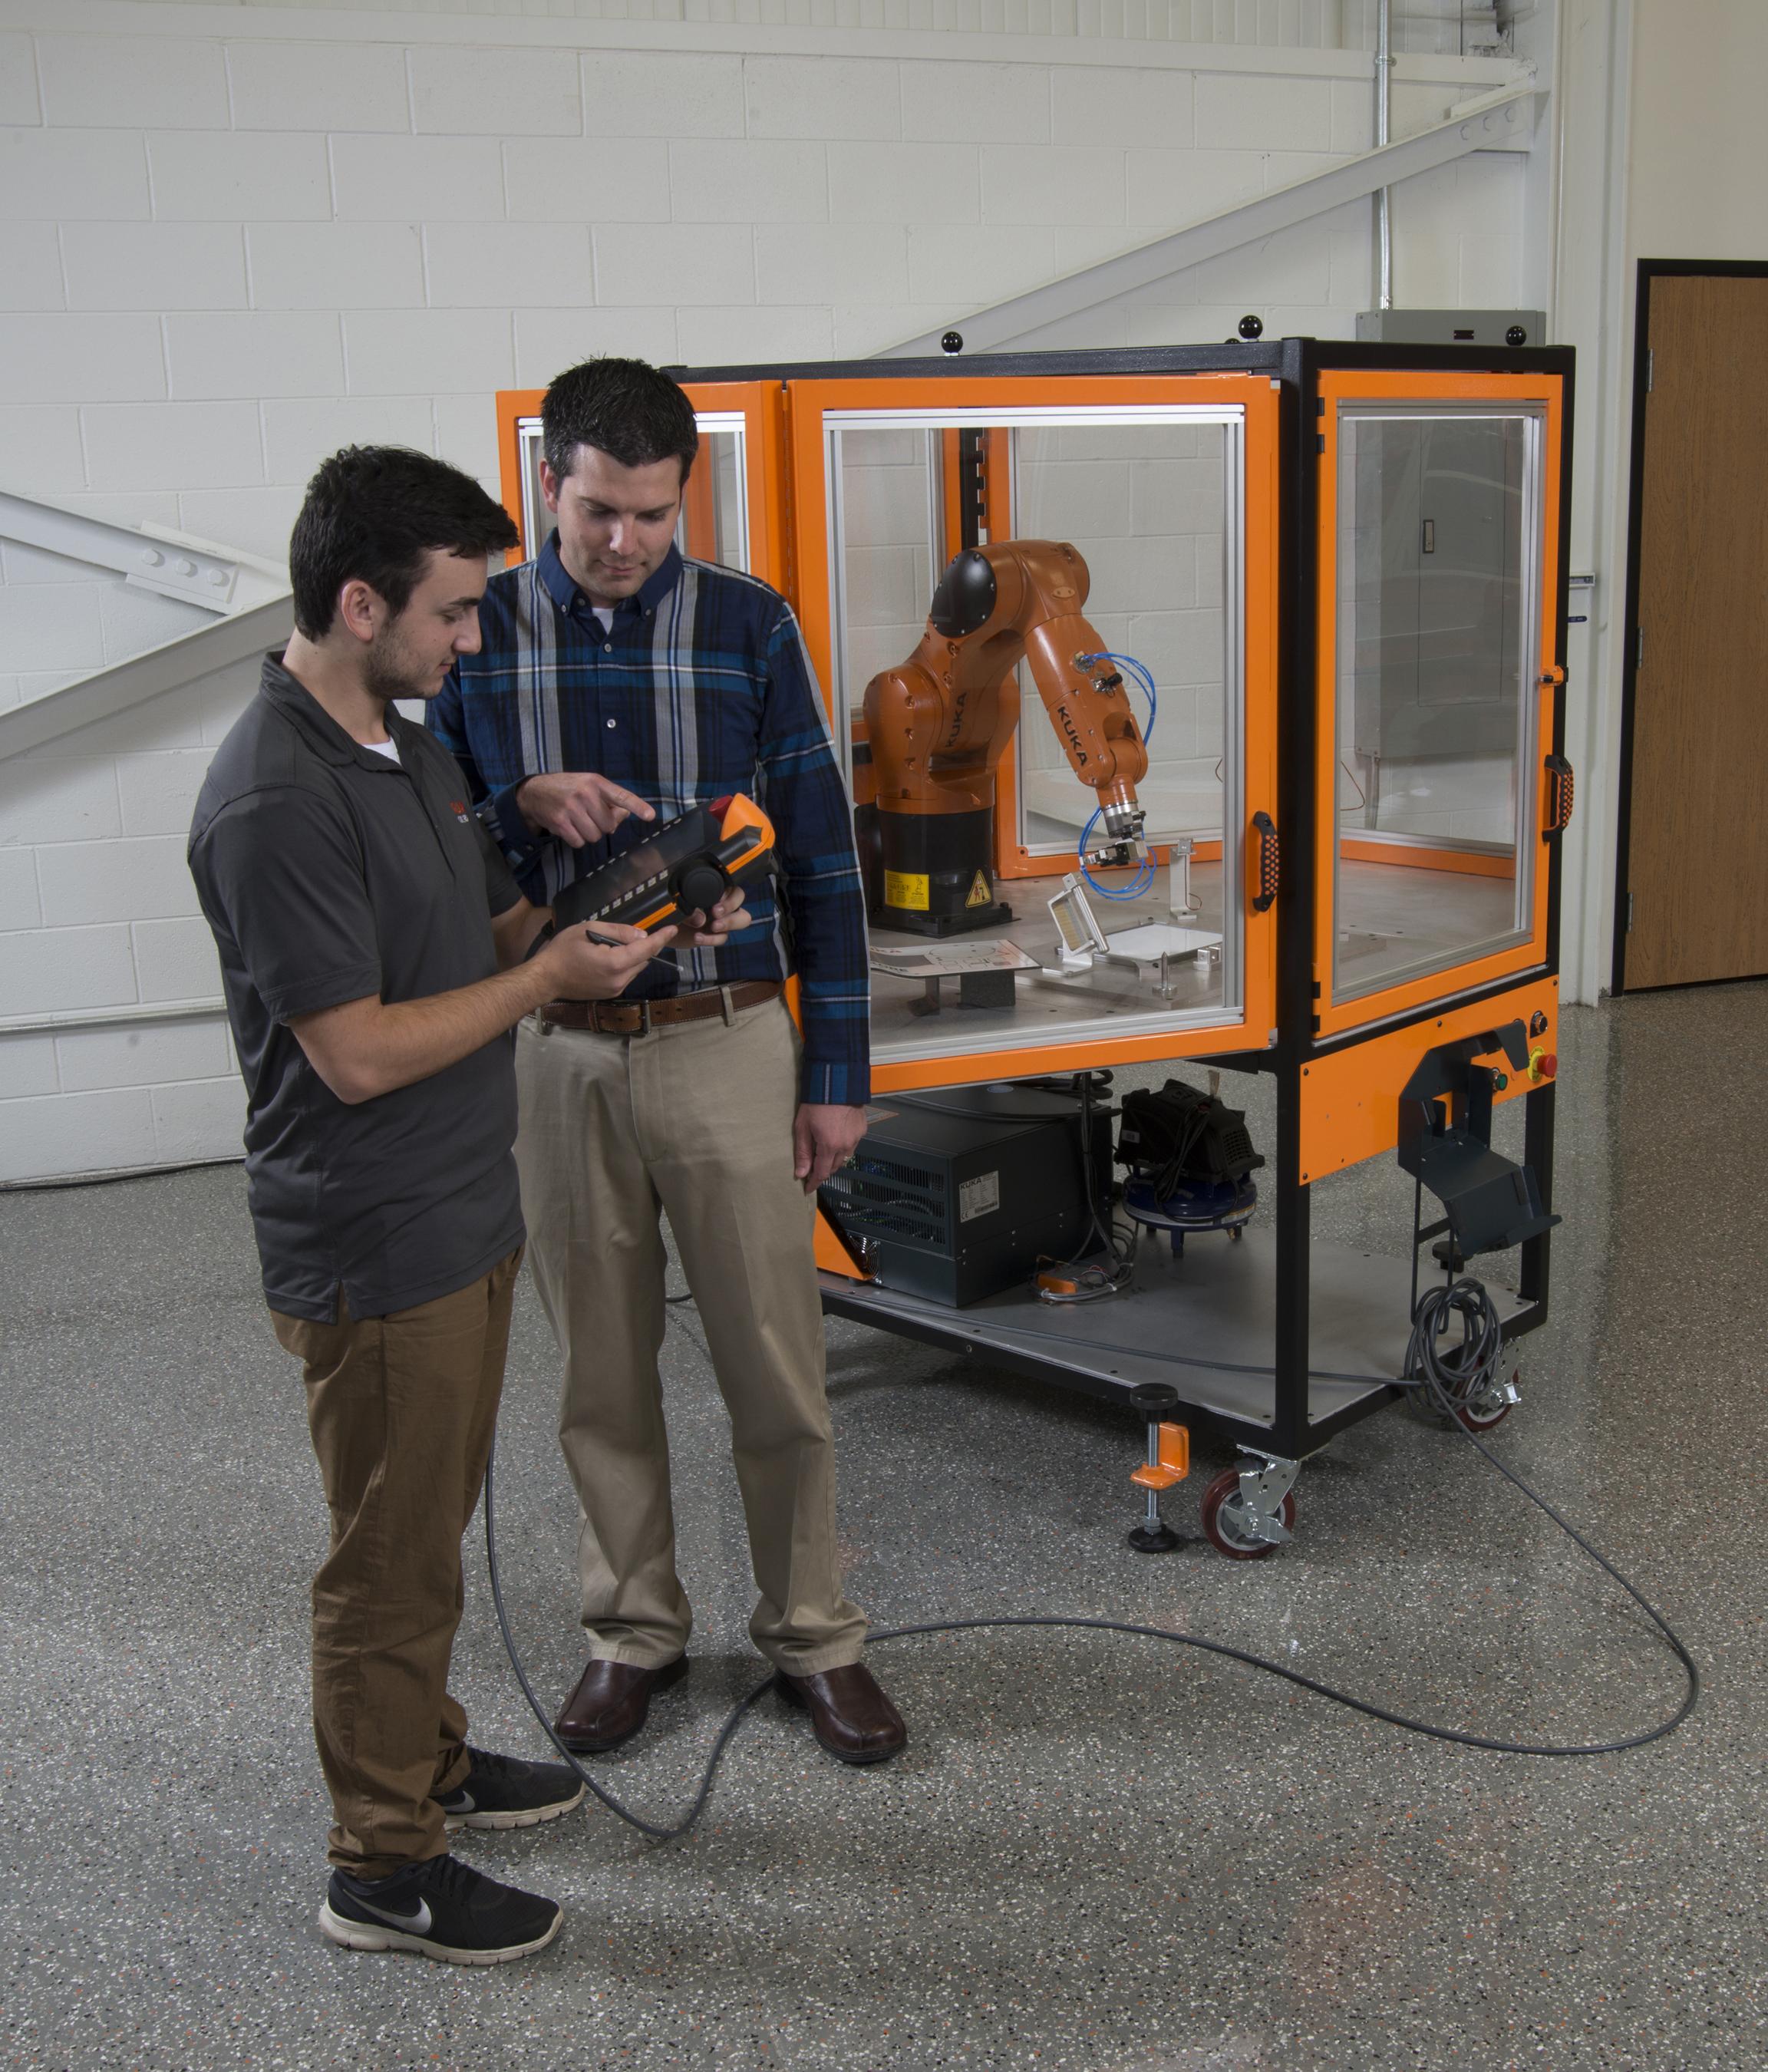 Kuka Robotics Corporation Debuts The Kore Of Stem Education At